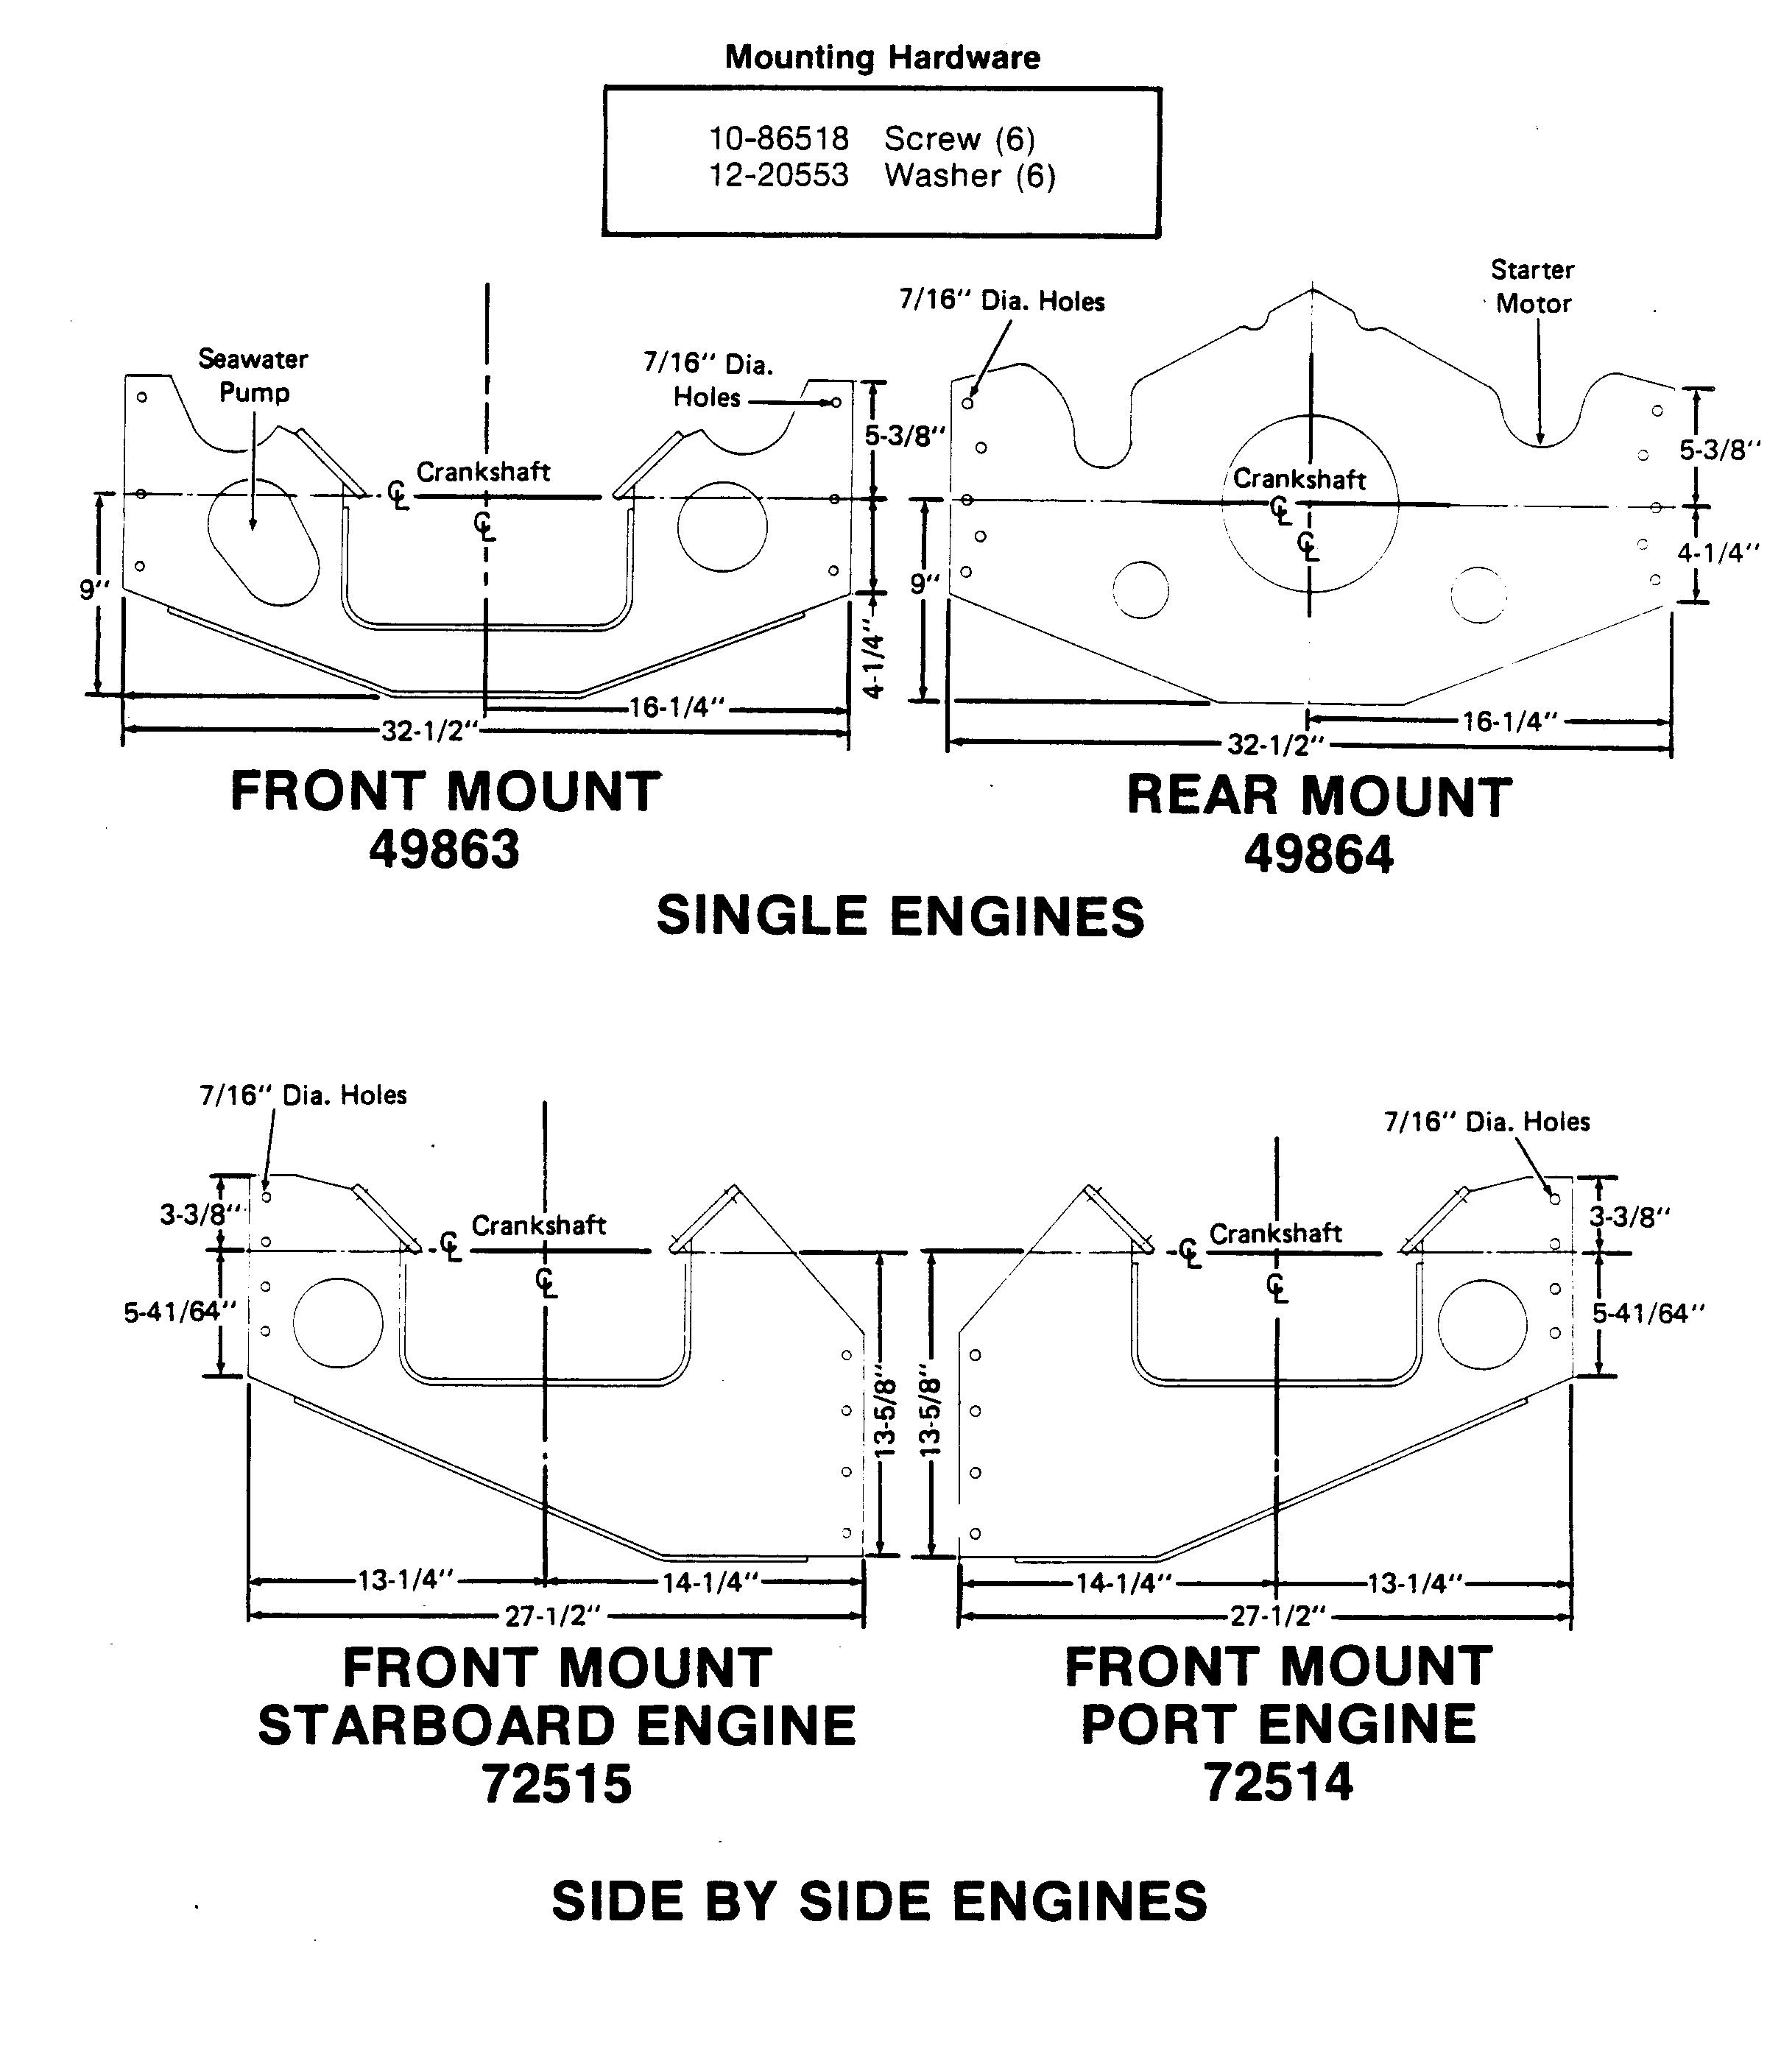 Gm 3 8 Engine Diagram Side View - Wiring Diagram Write